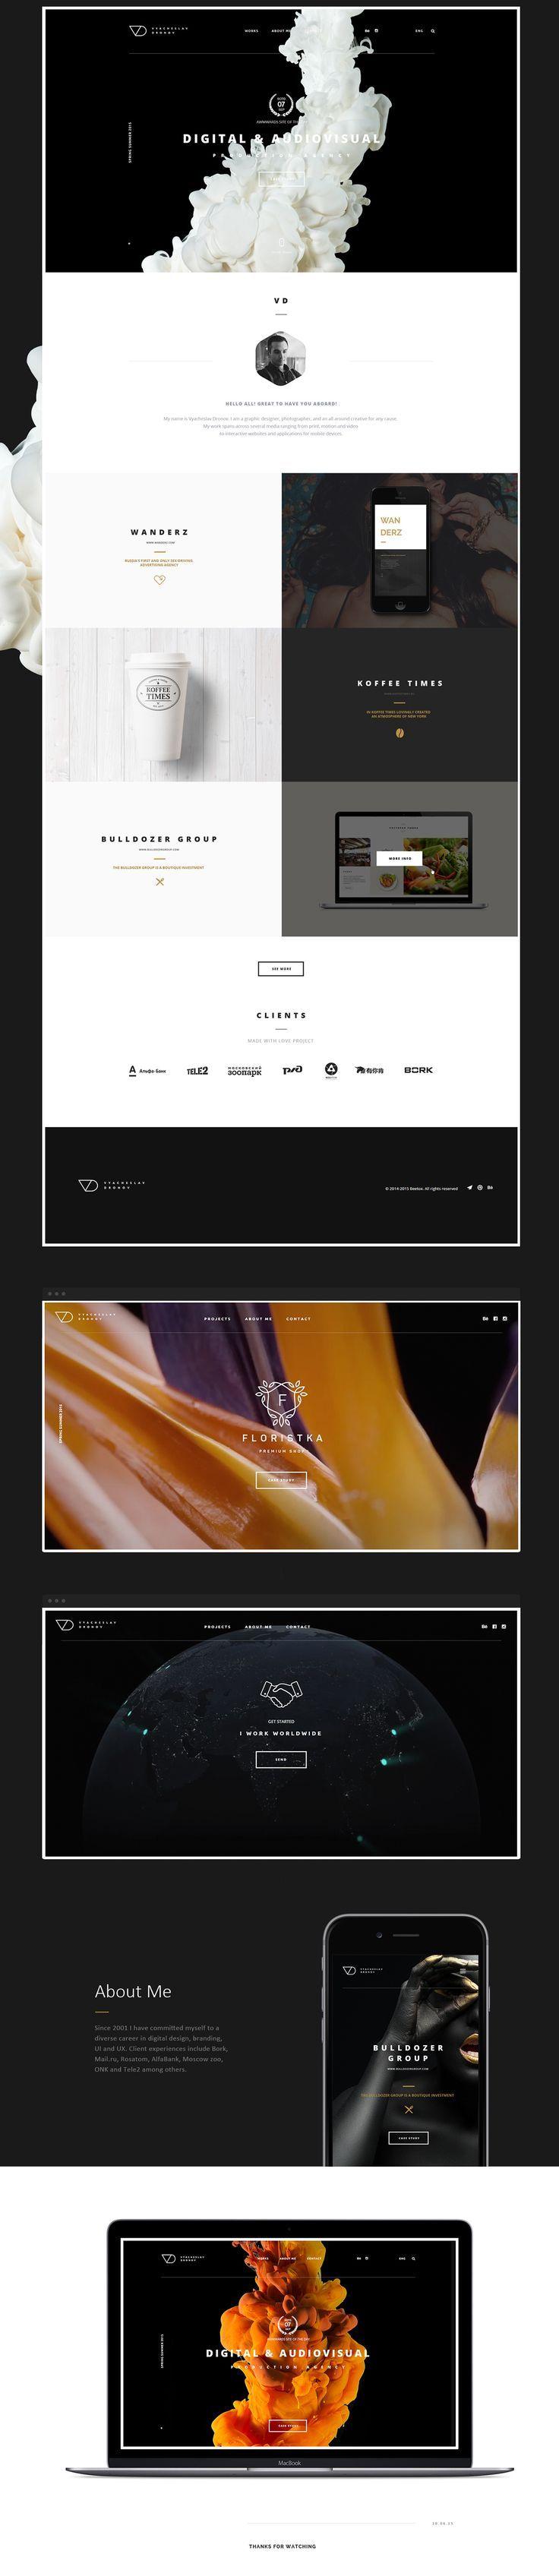 Purveyors Of Minimalist Ideas Curators Of Minimalist Goods Join The Club Web Design Web Design Inspiration Web Development Design